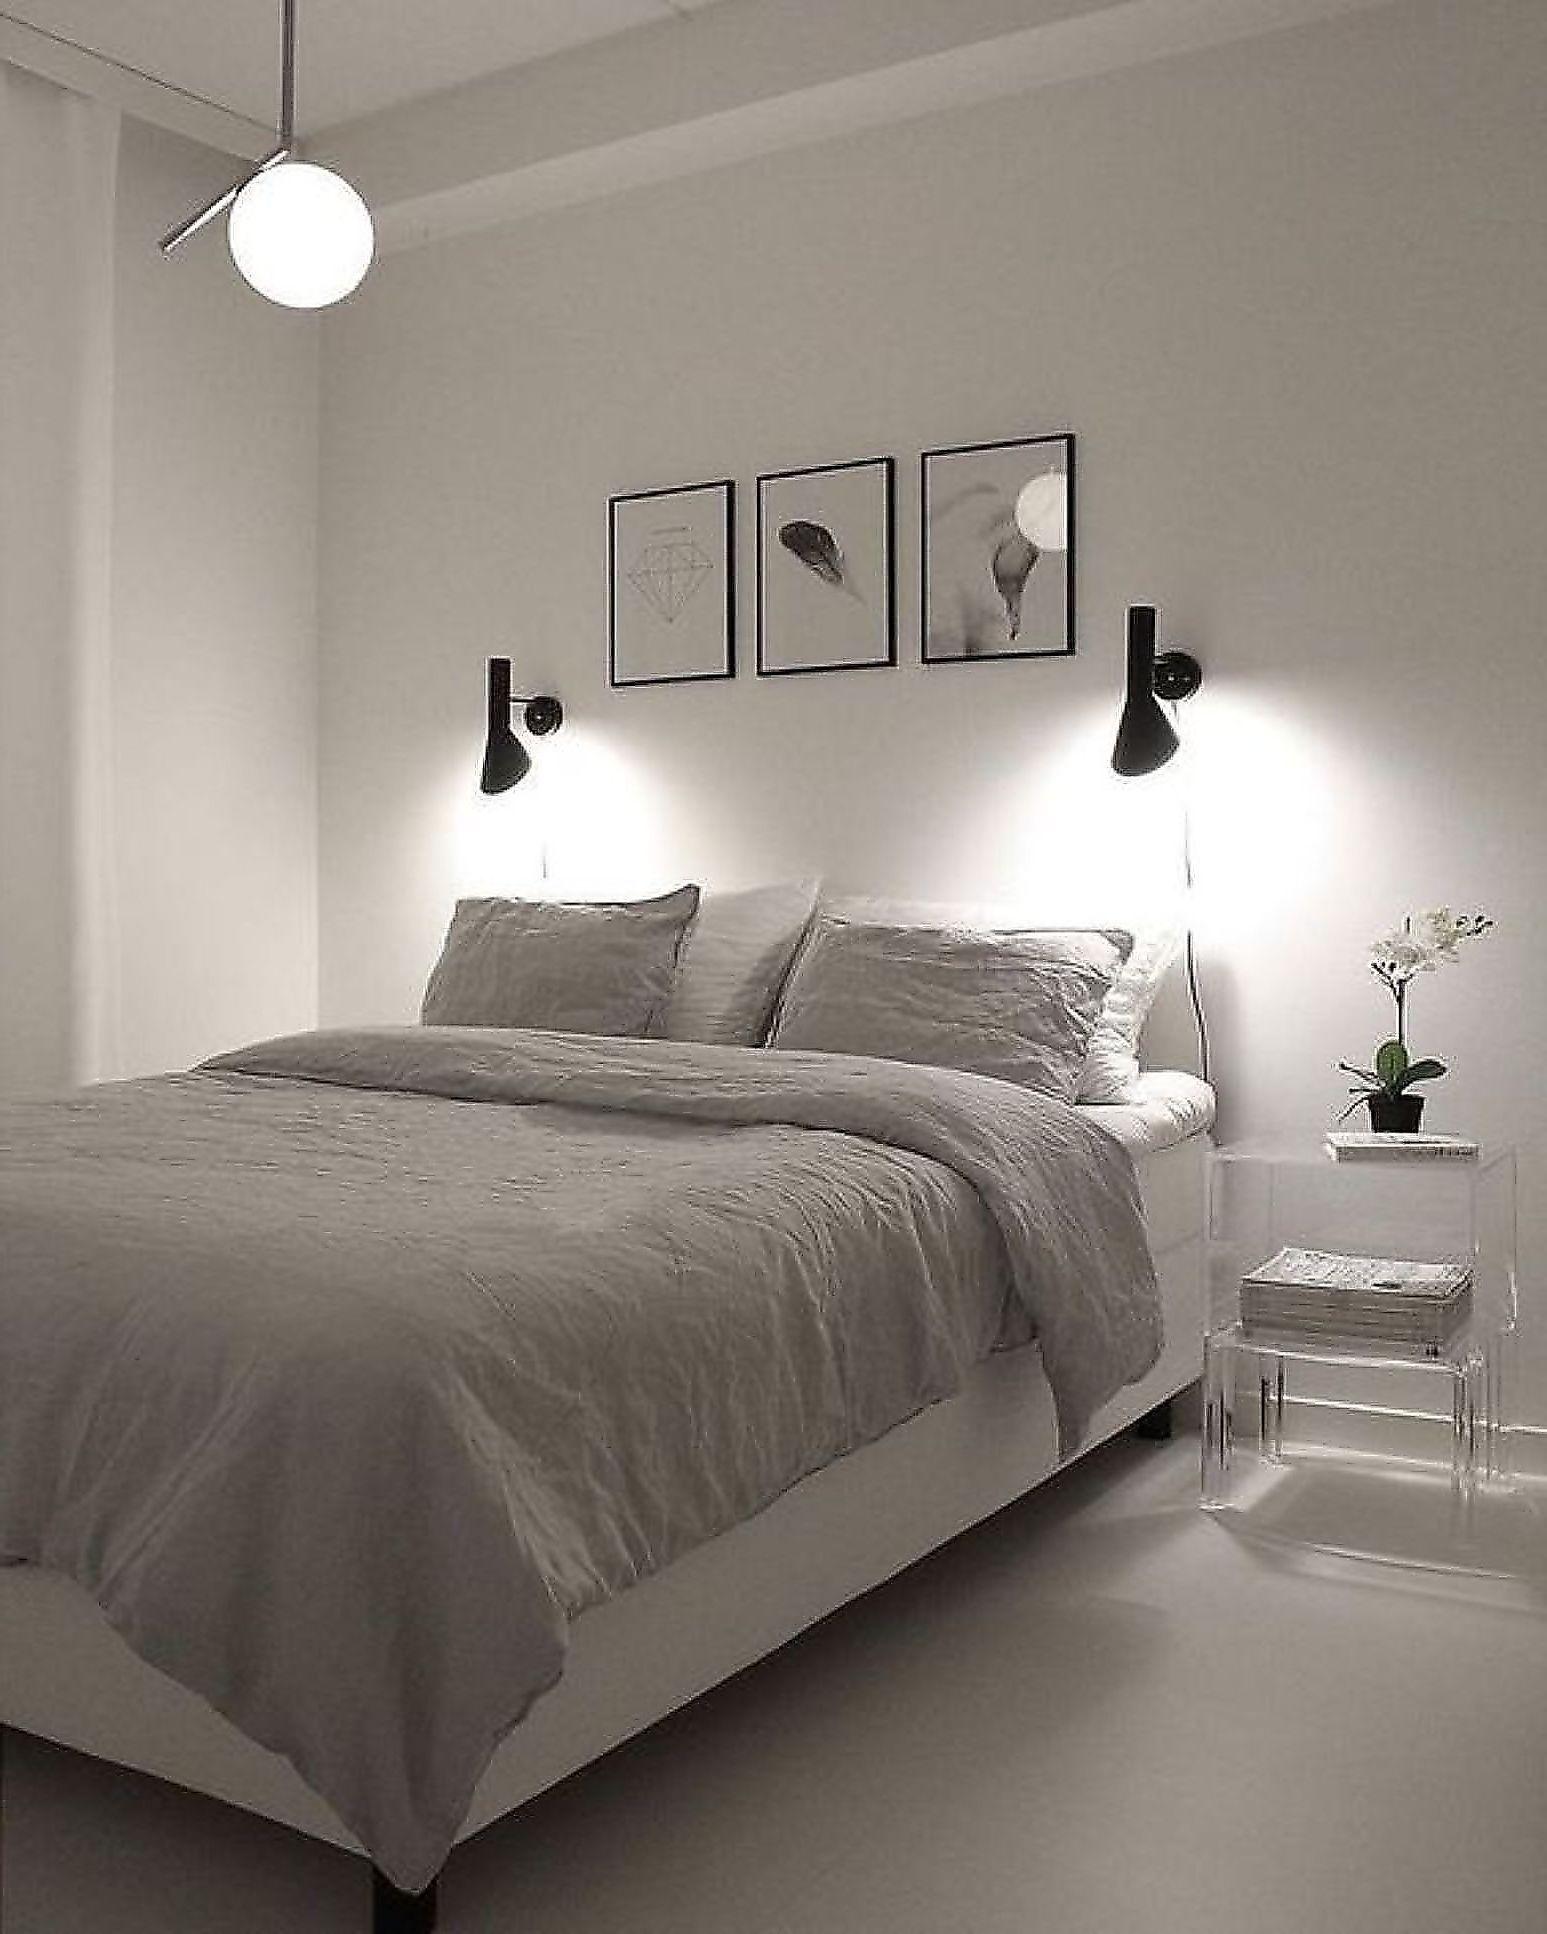 46 Cool Bedroom Tv Wall Design Ideas Simple Bedroom Room Inspiration Bedroom Minimalist Bedroom Decor